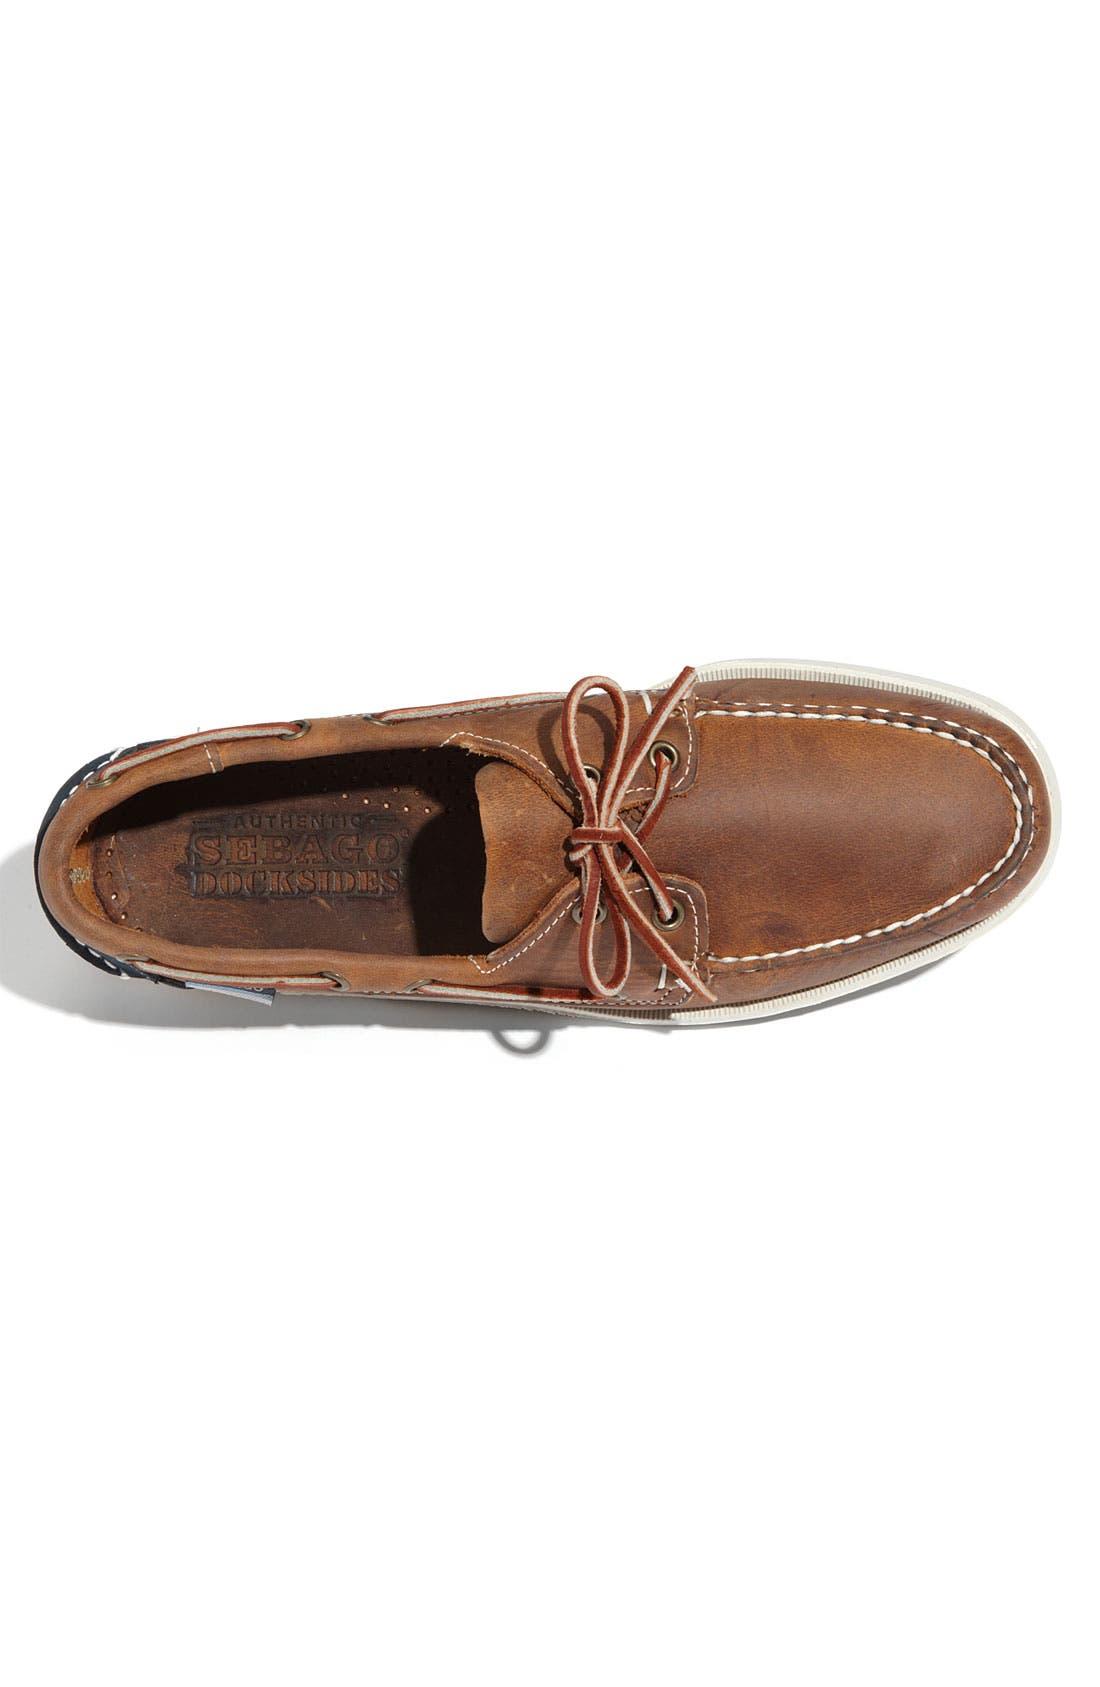 Alternate Image 3  - Sebago 'Spinnaker' Boat Shoe (Men)